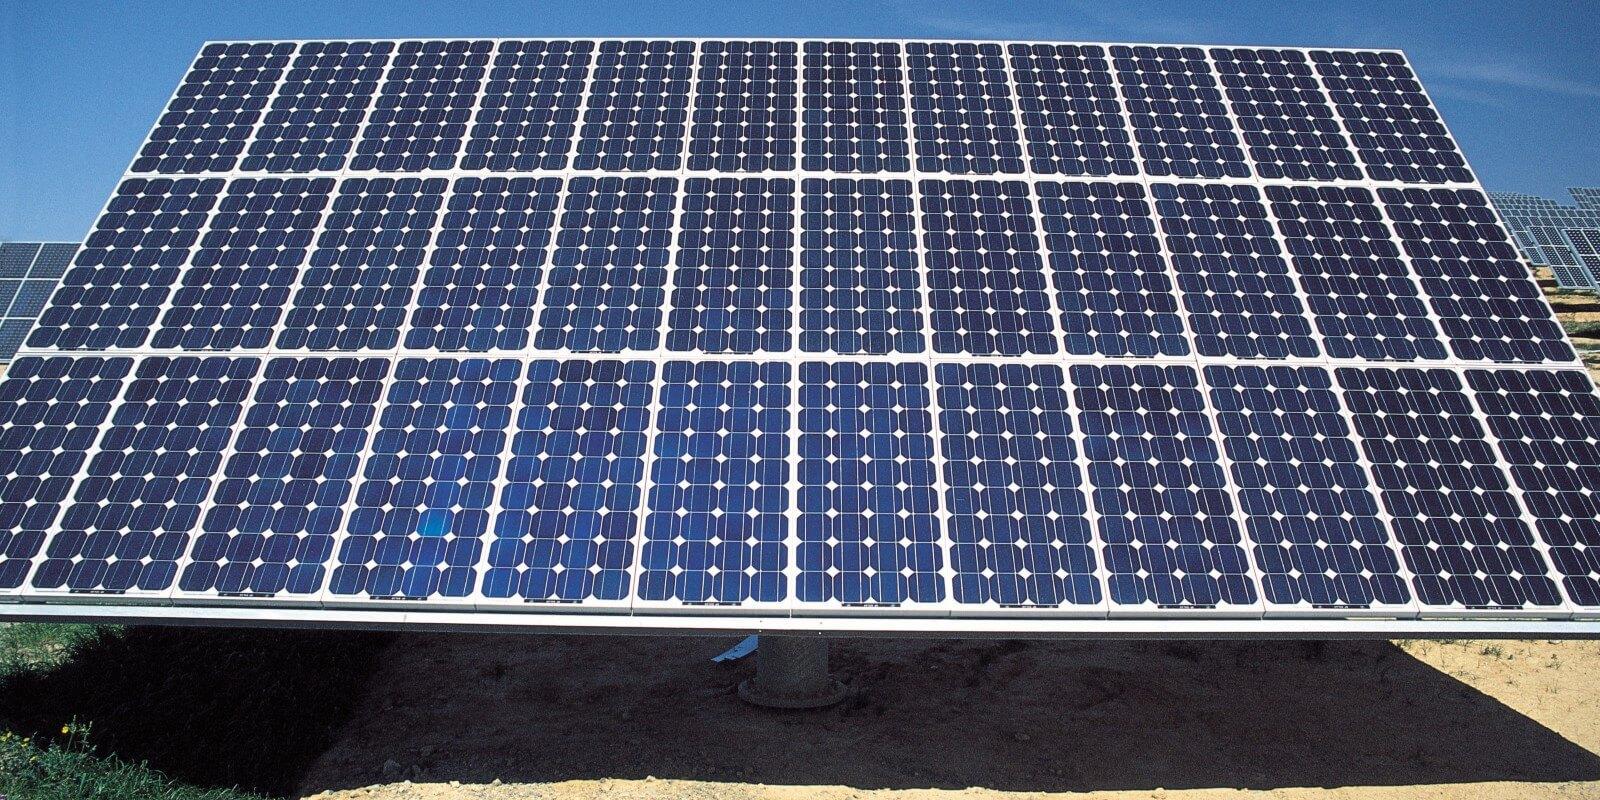 ACCIONA Energía secures EU funding for solar powered irrigation